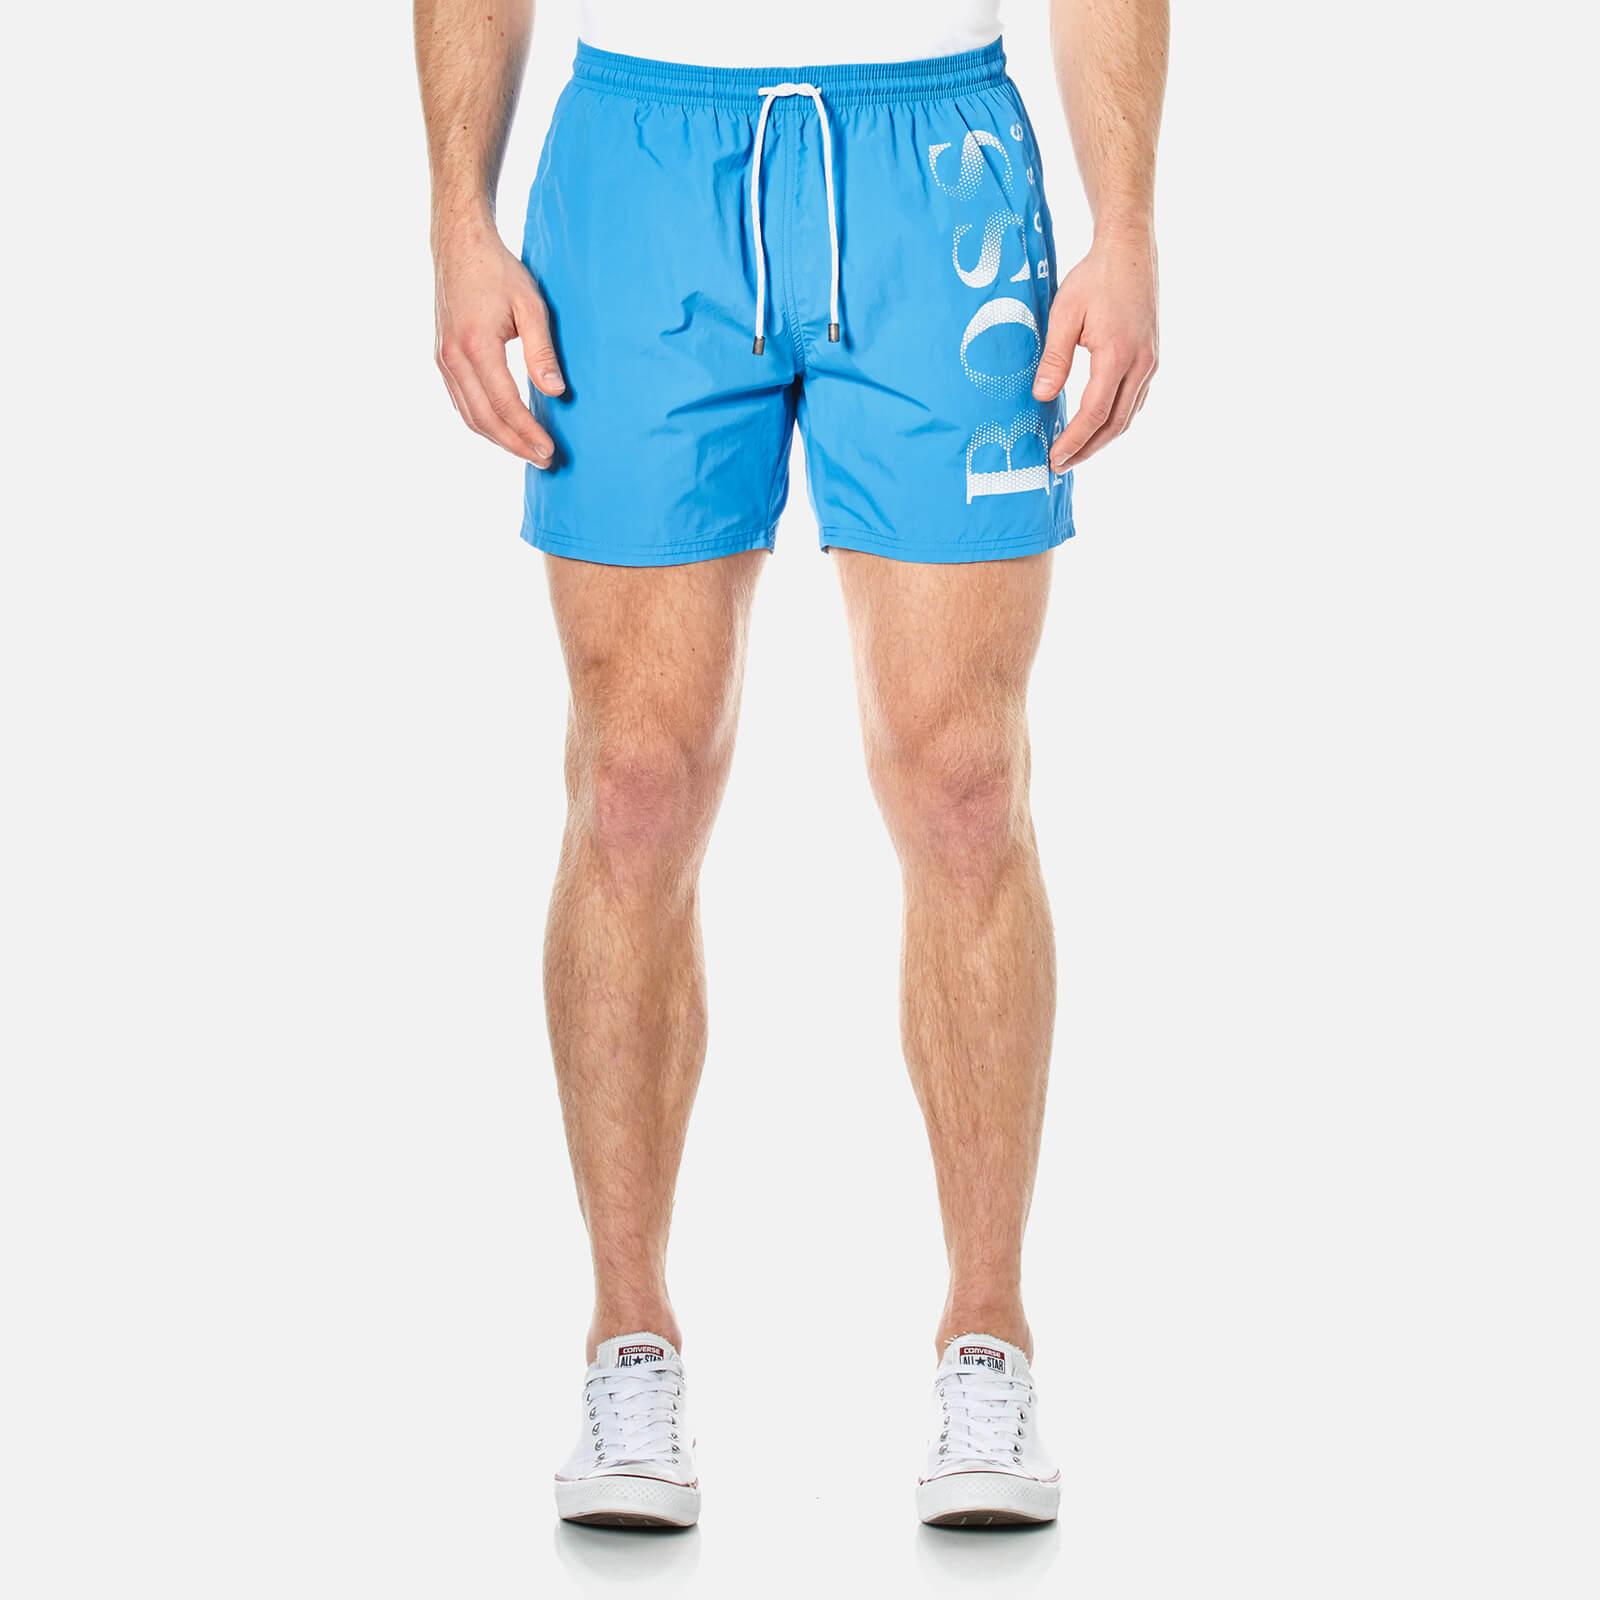 e7ec6d66ab BOSS Hugo Boss Men's Octopus Swim Shorts - Blue Mens Underwear   TheHut.com